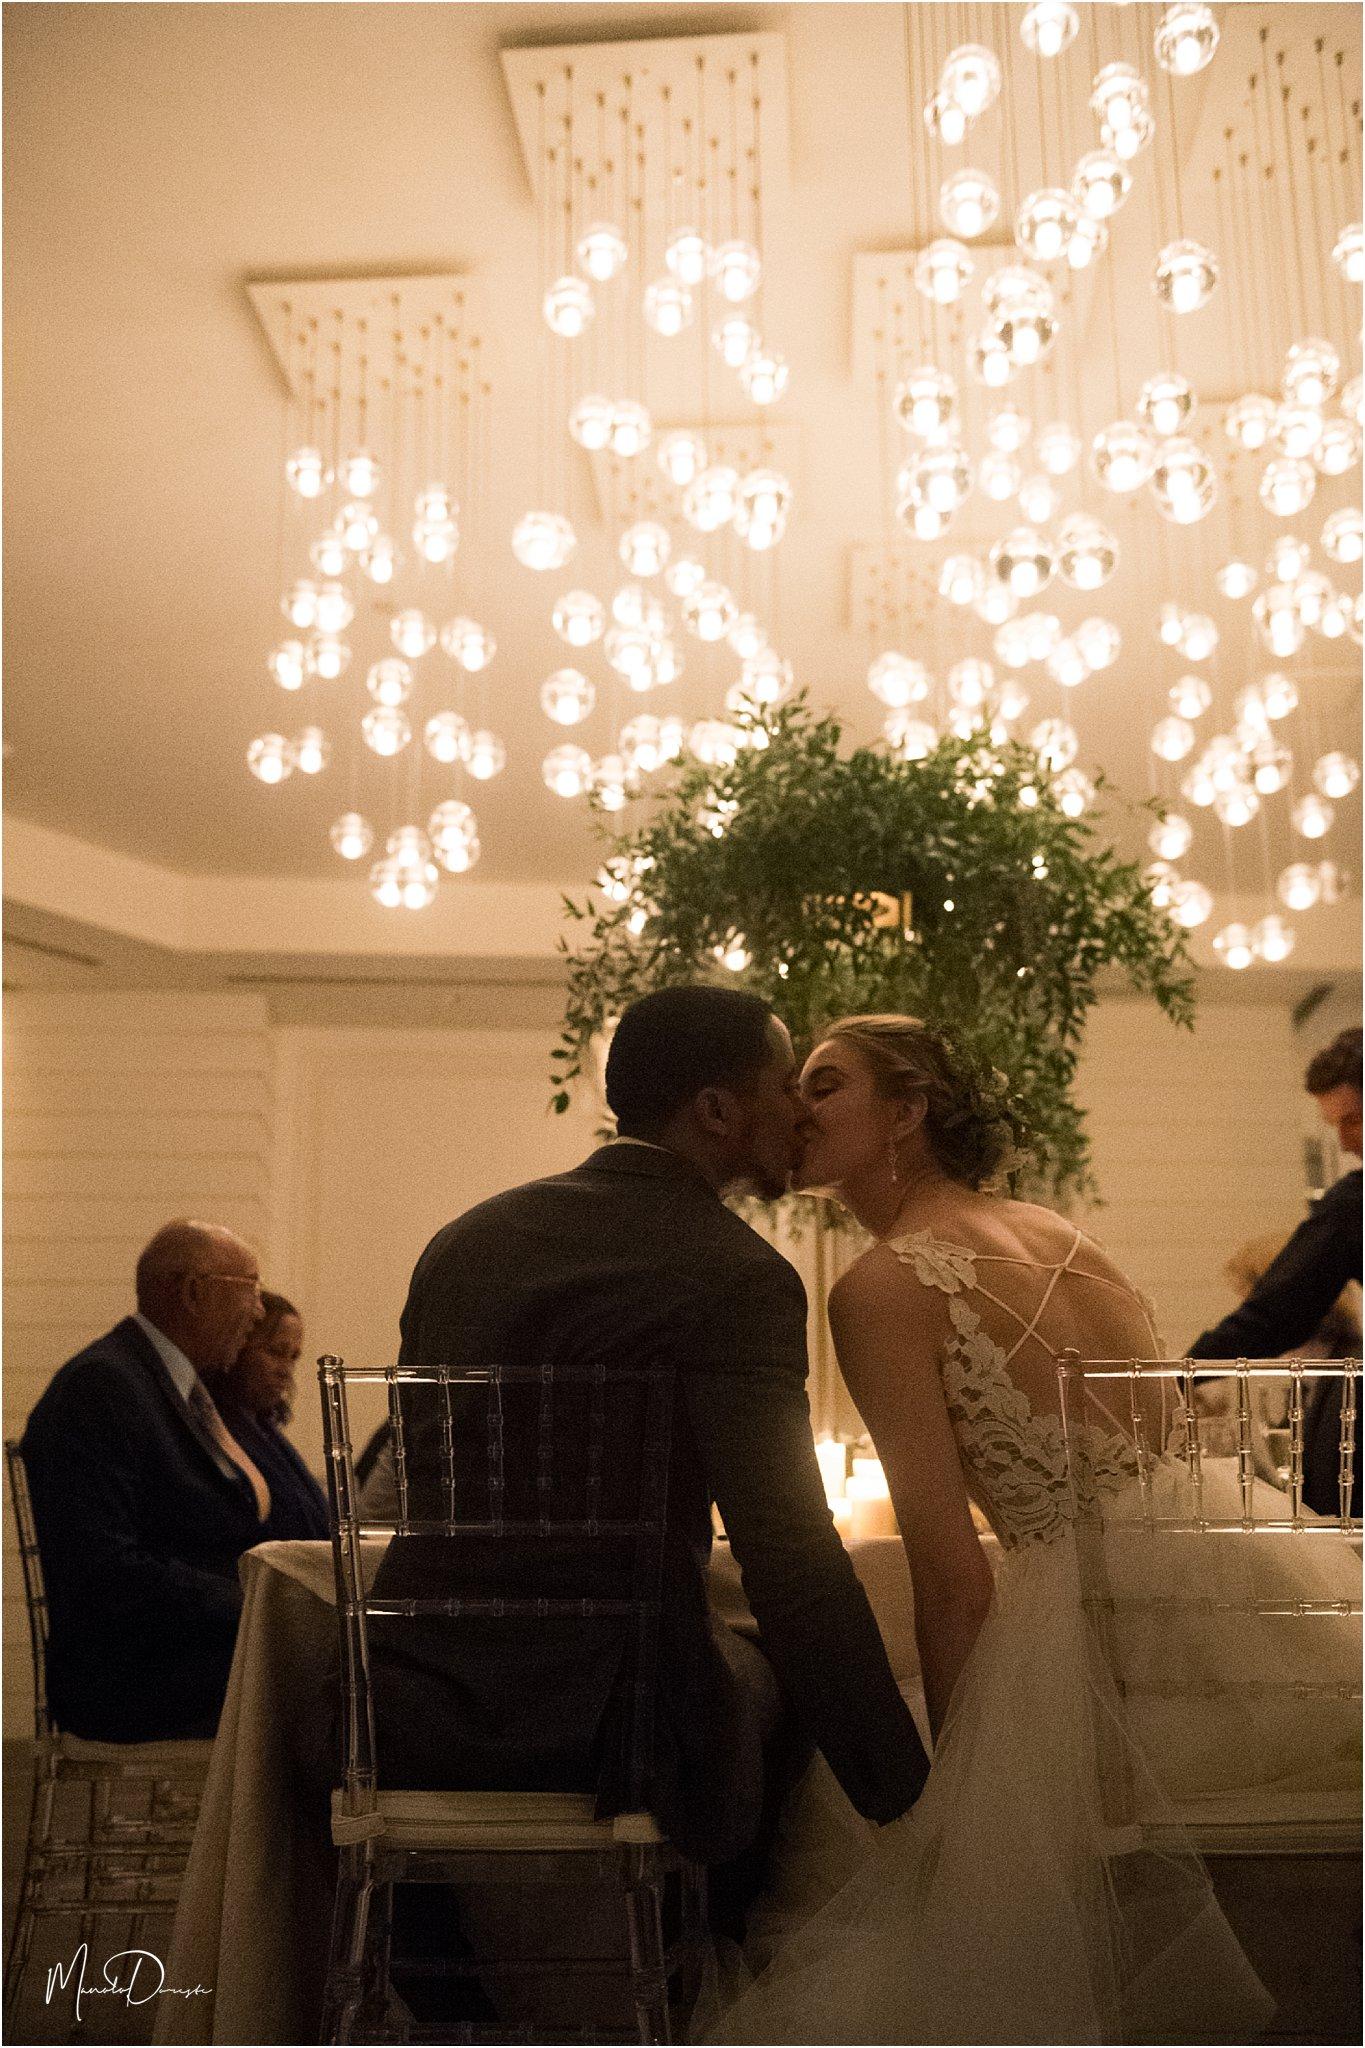 00889_ManoloDoreste_InFocusStudios_Wedding_Family_Photography_Miami_MiamiPhotographer.jpg